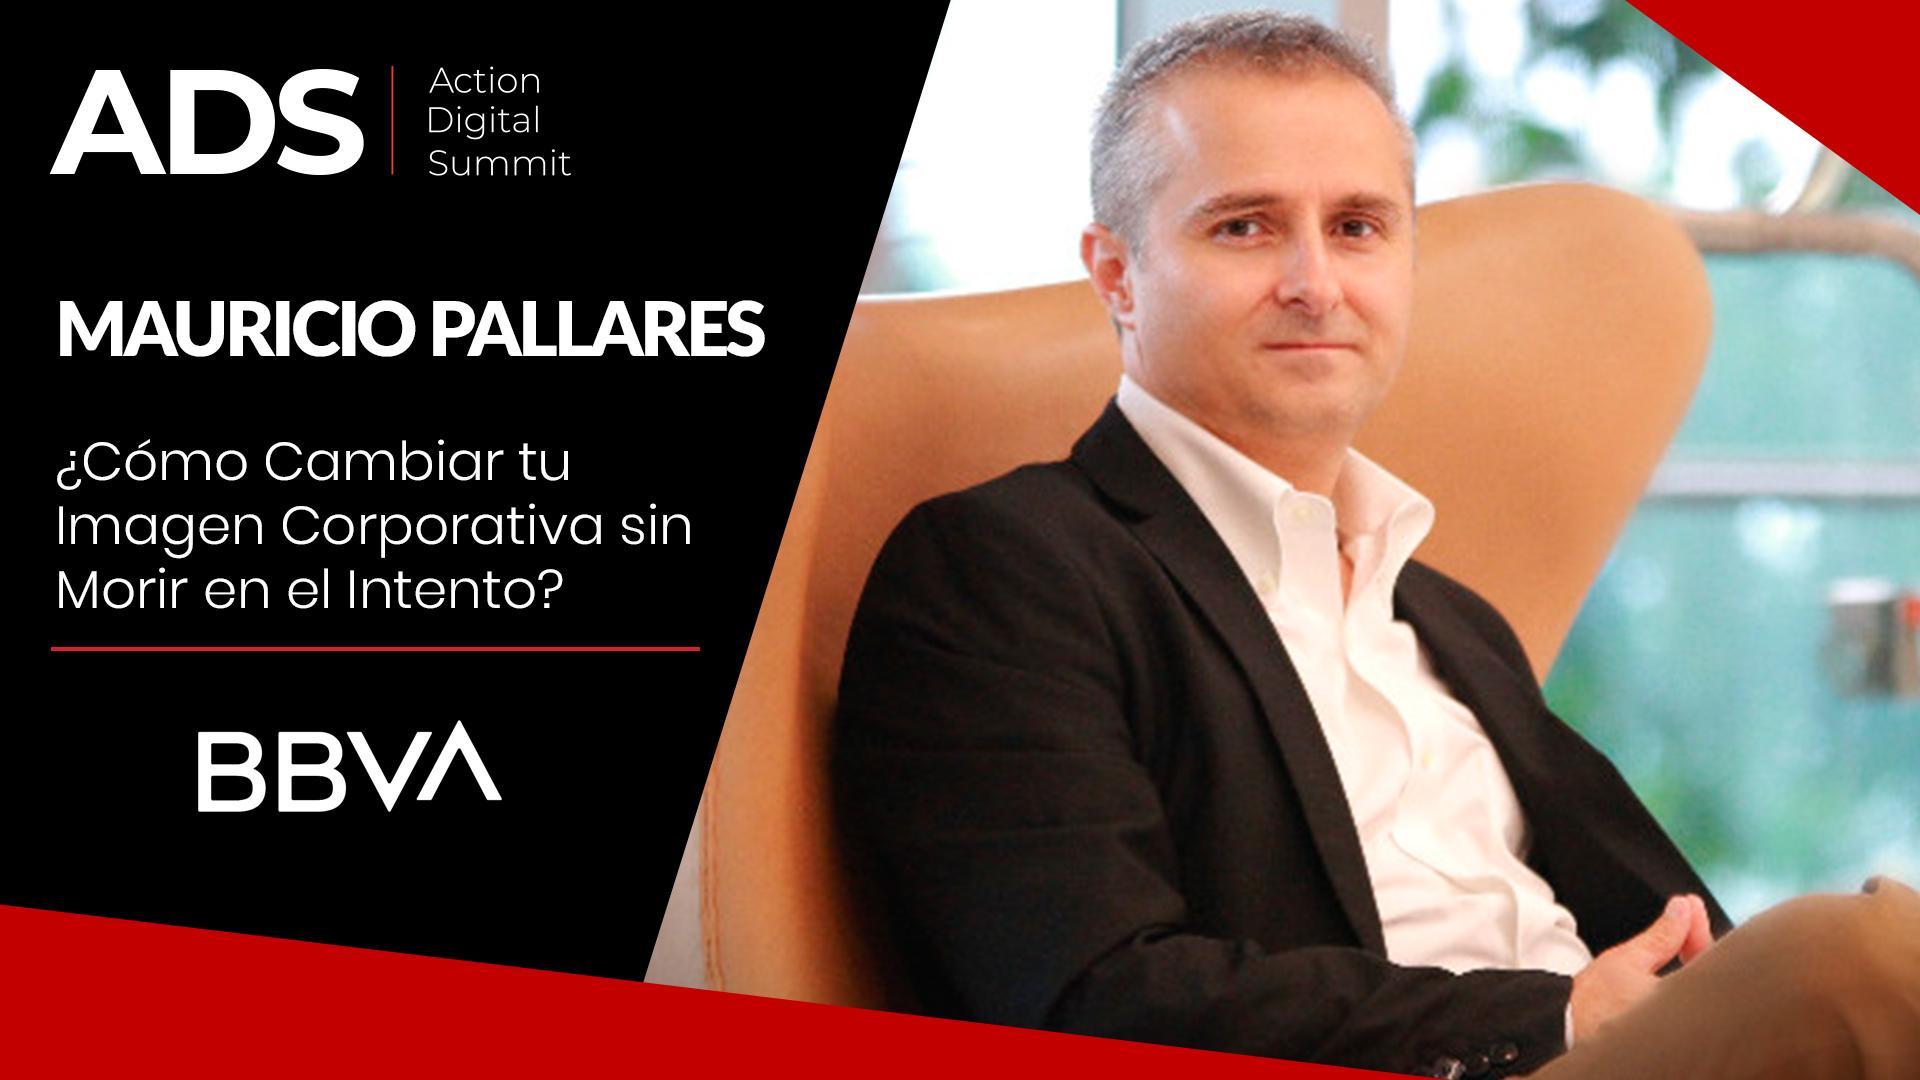 Mauricio Pallares